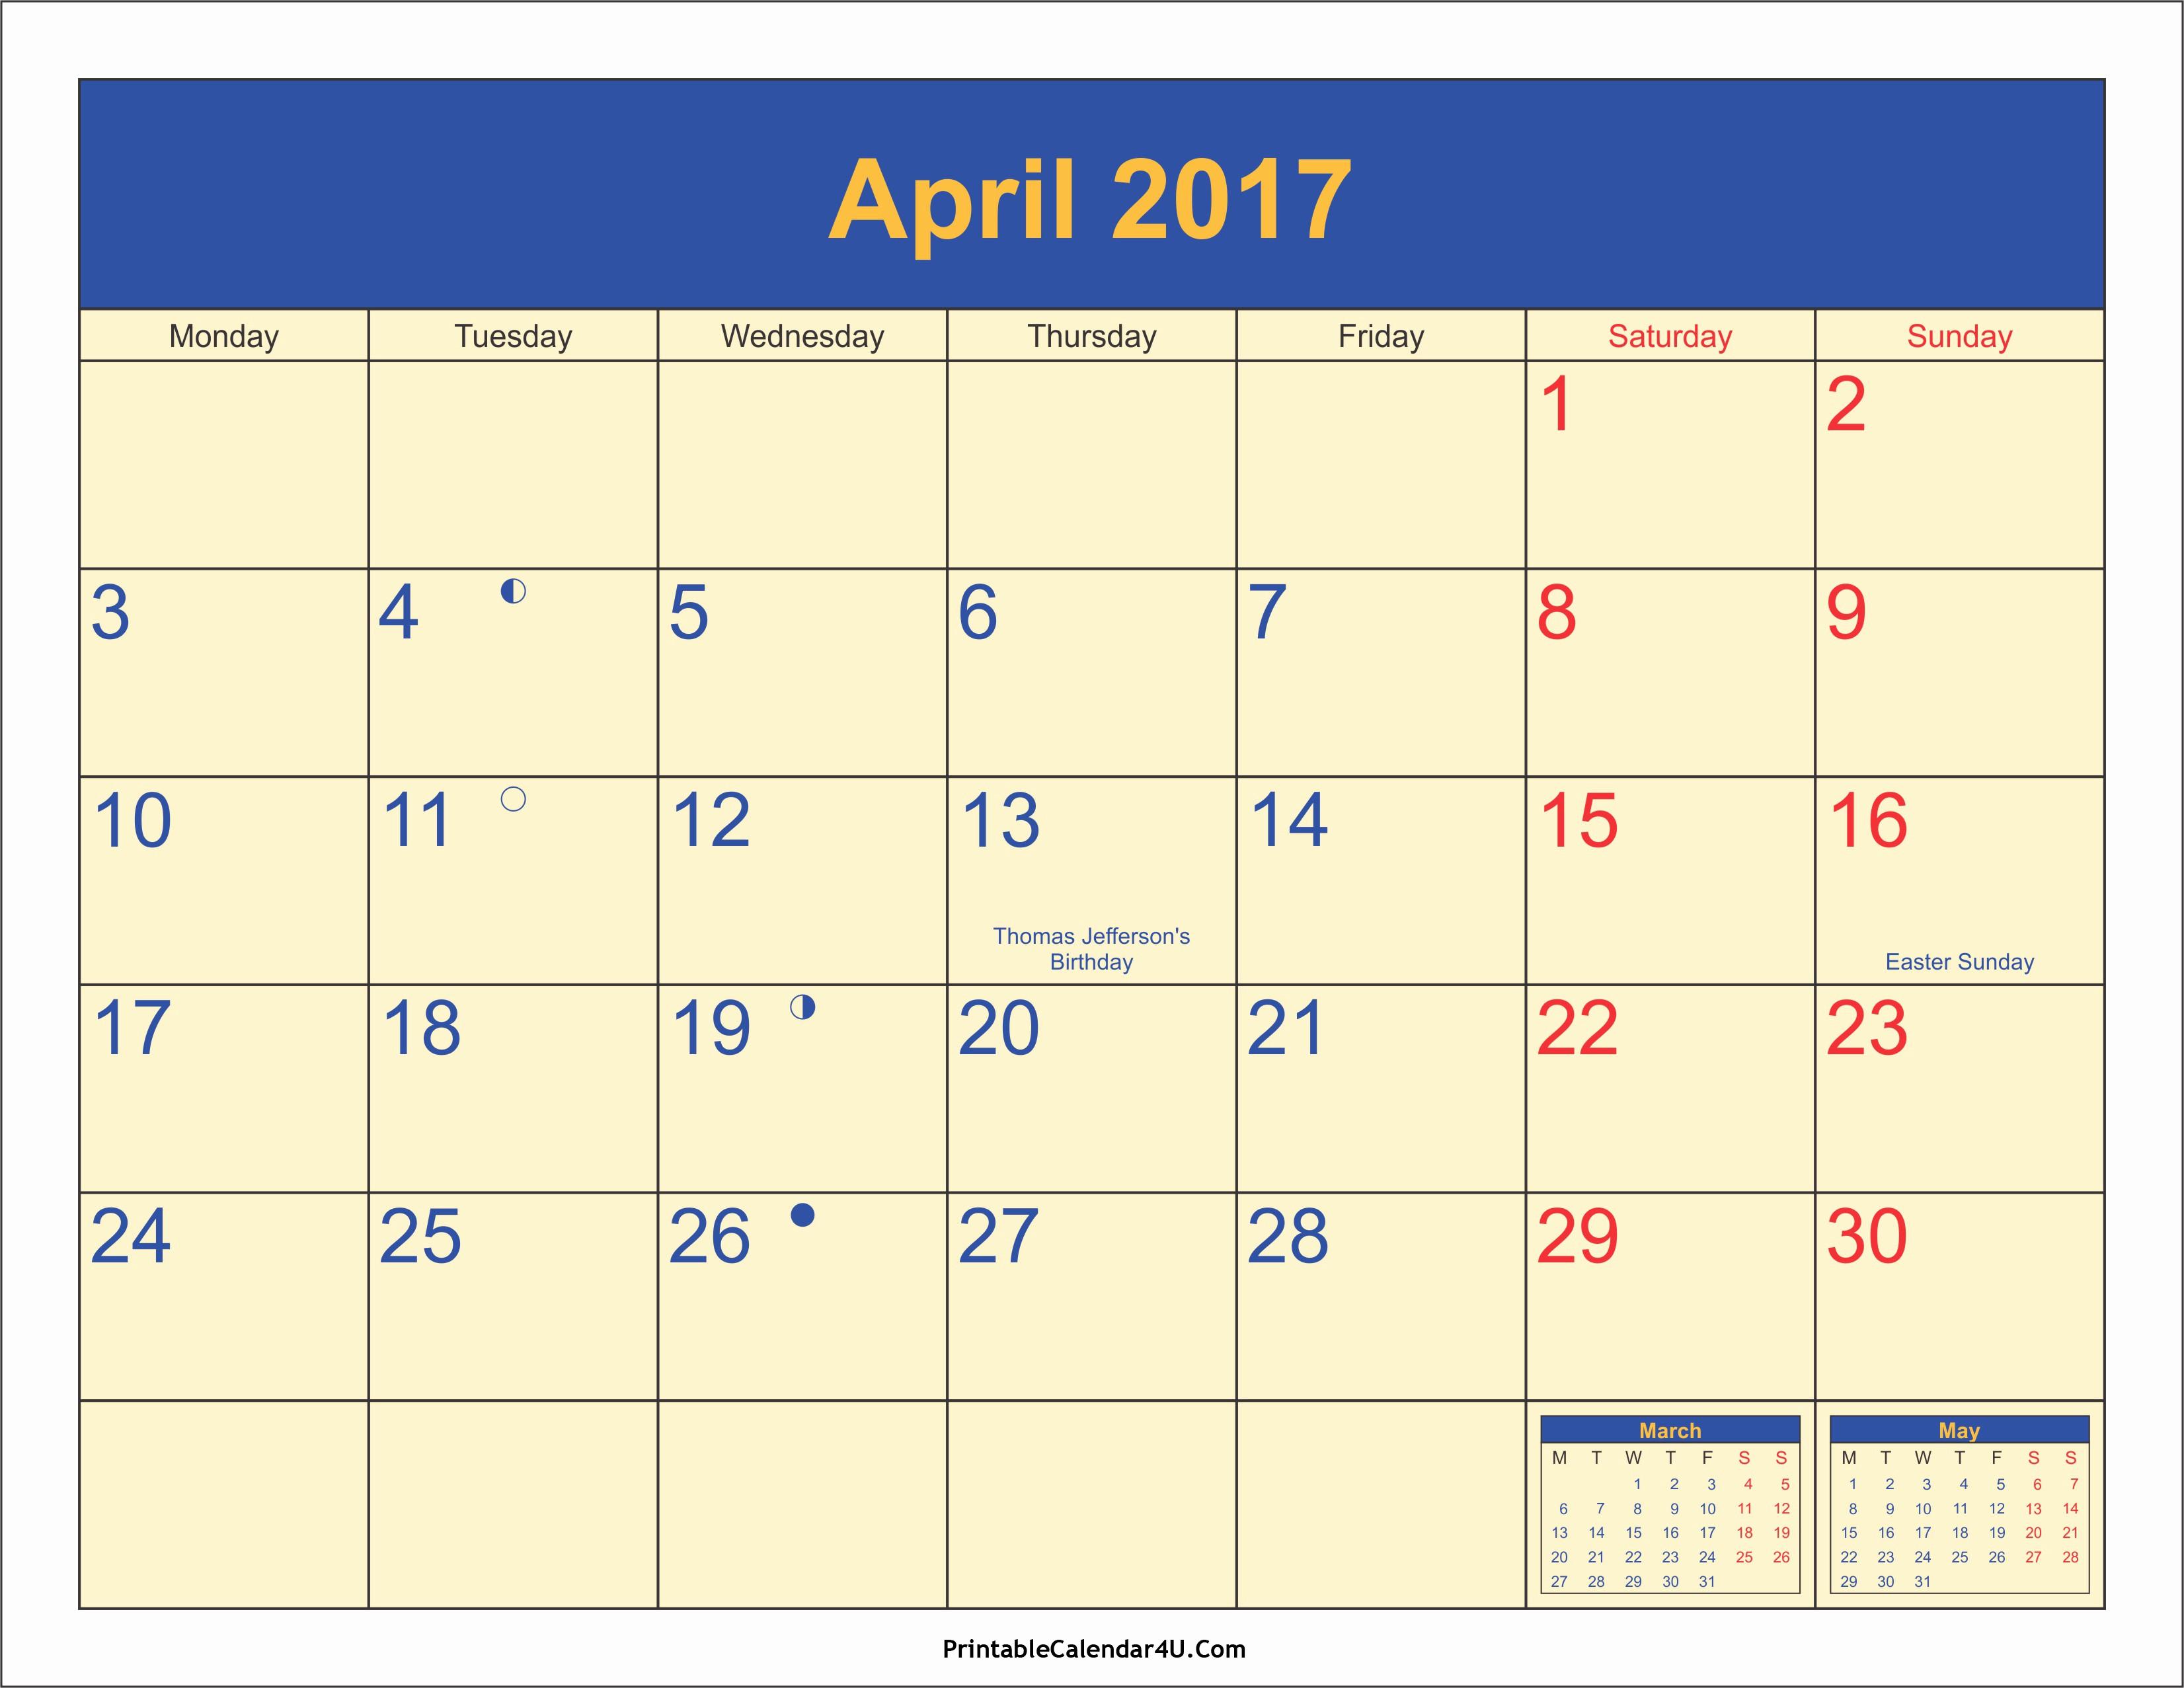 2017 Calendar with Holidays Template Unique April 2017 Calendar with Holidays